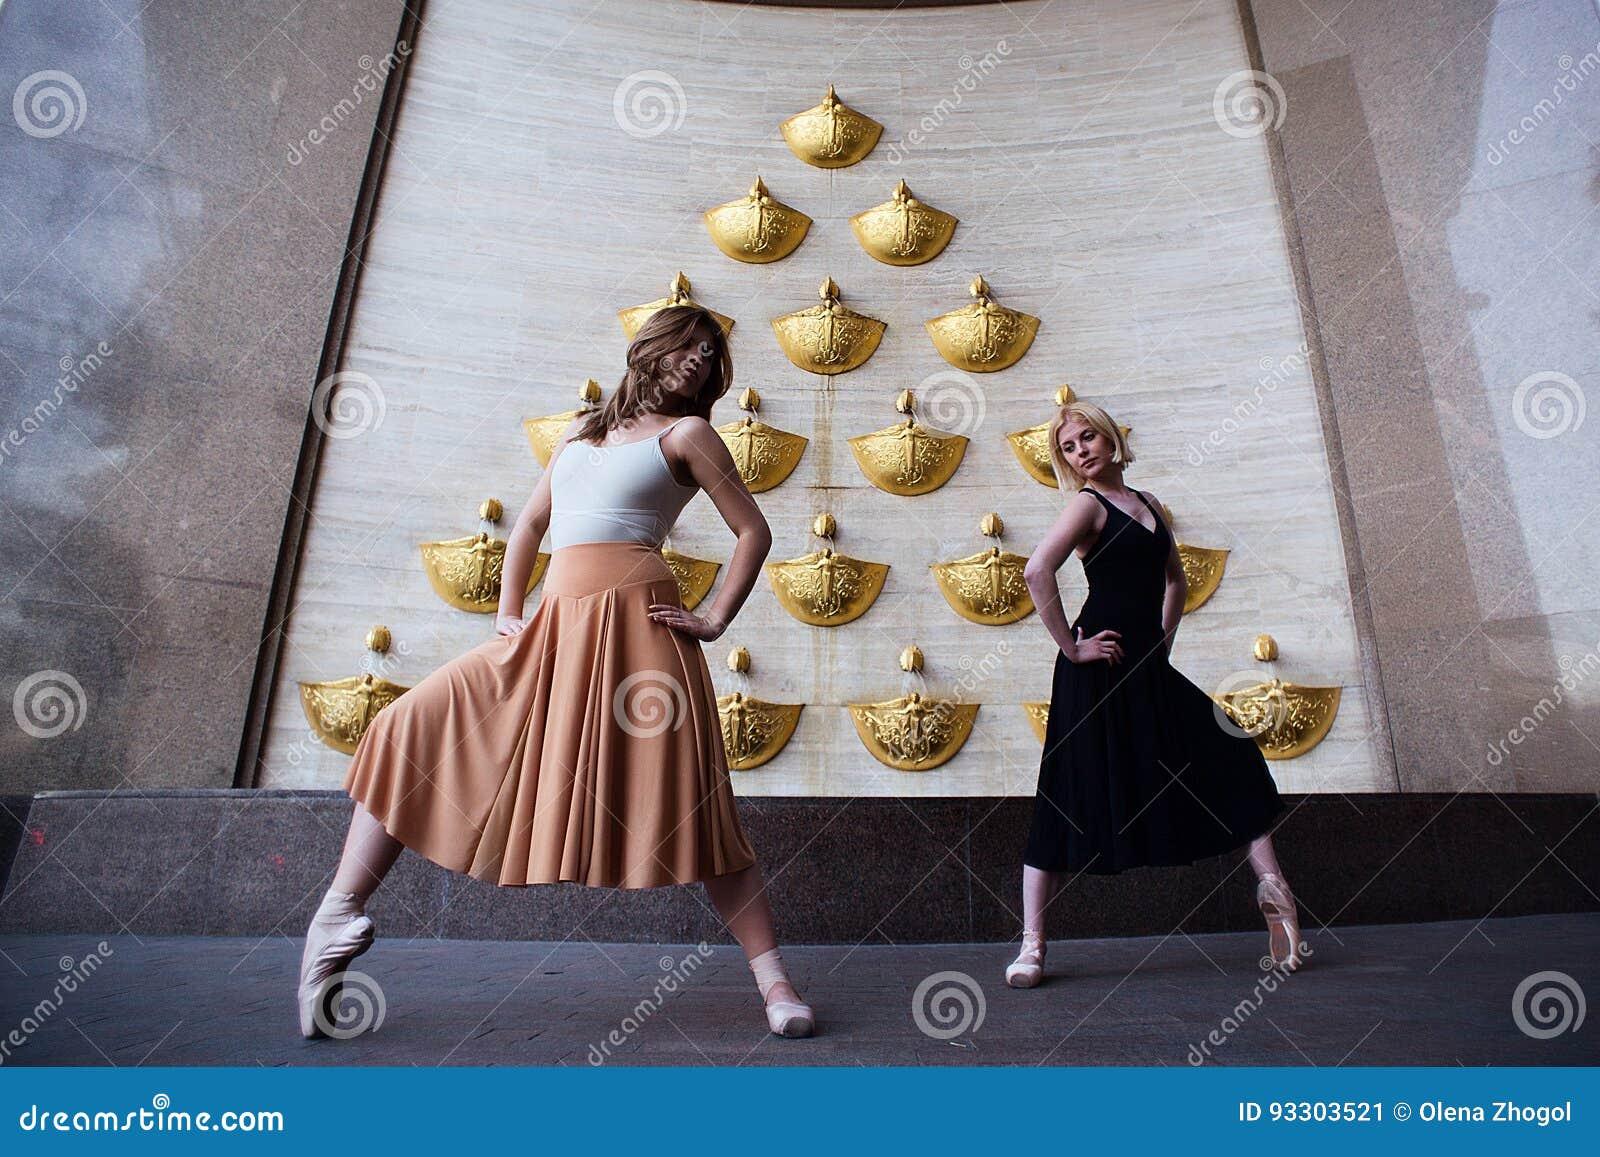 Ballet dancers on the city street